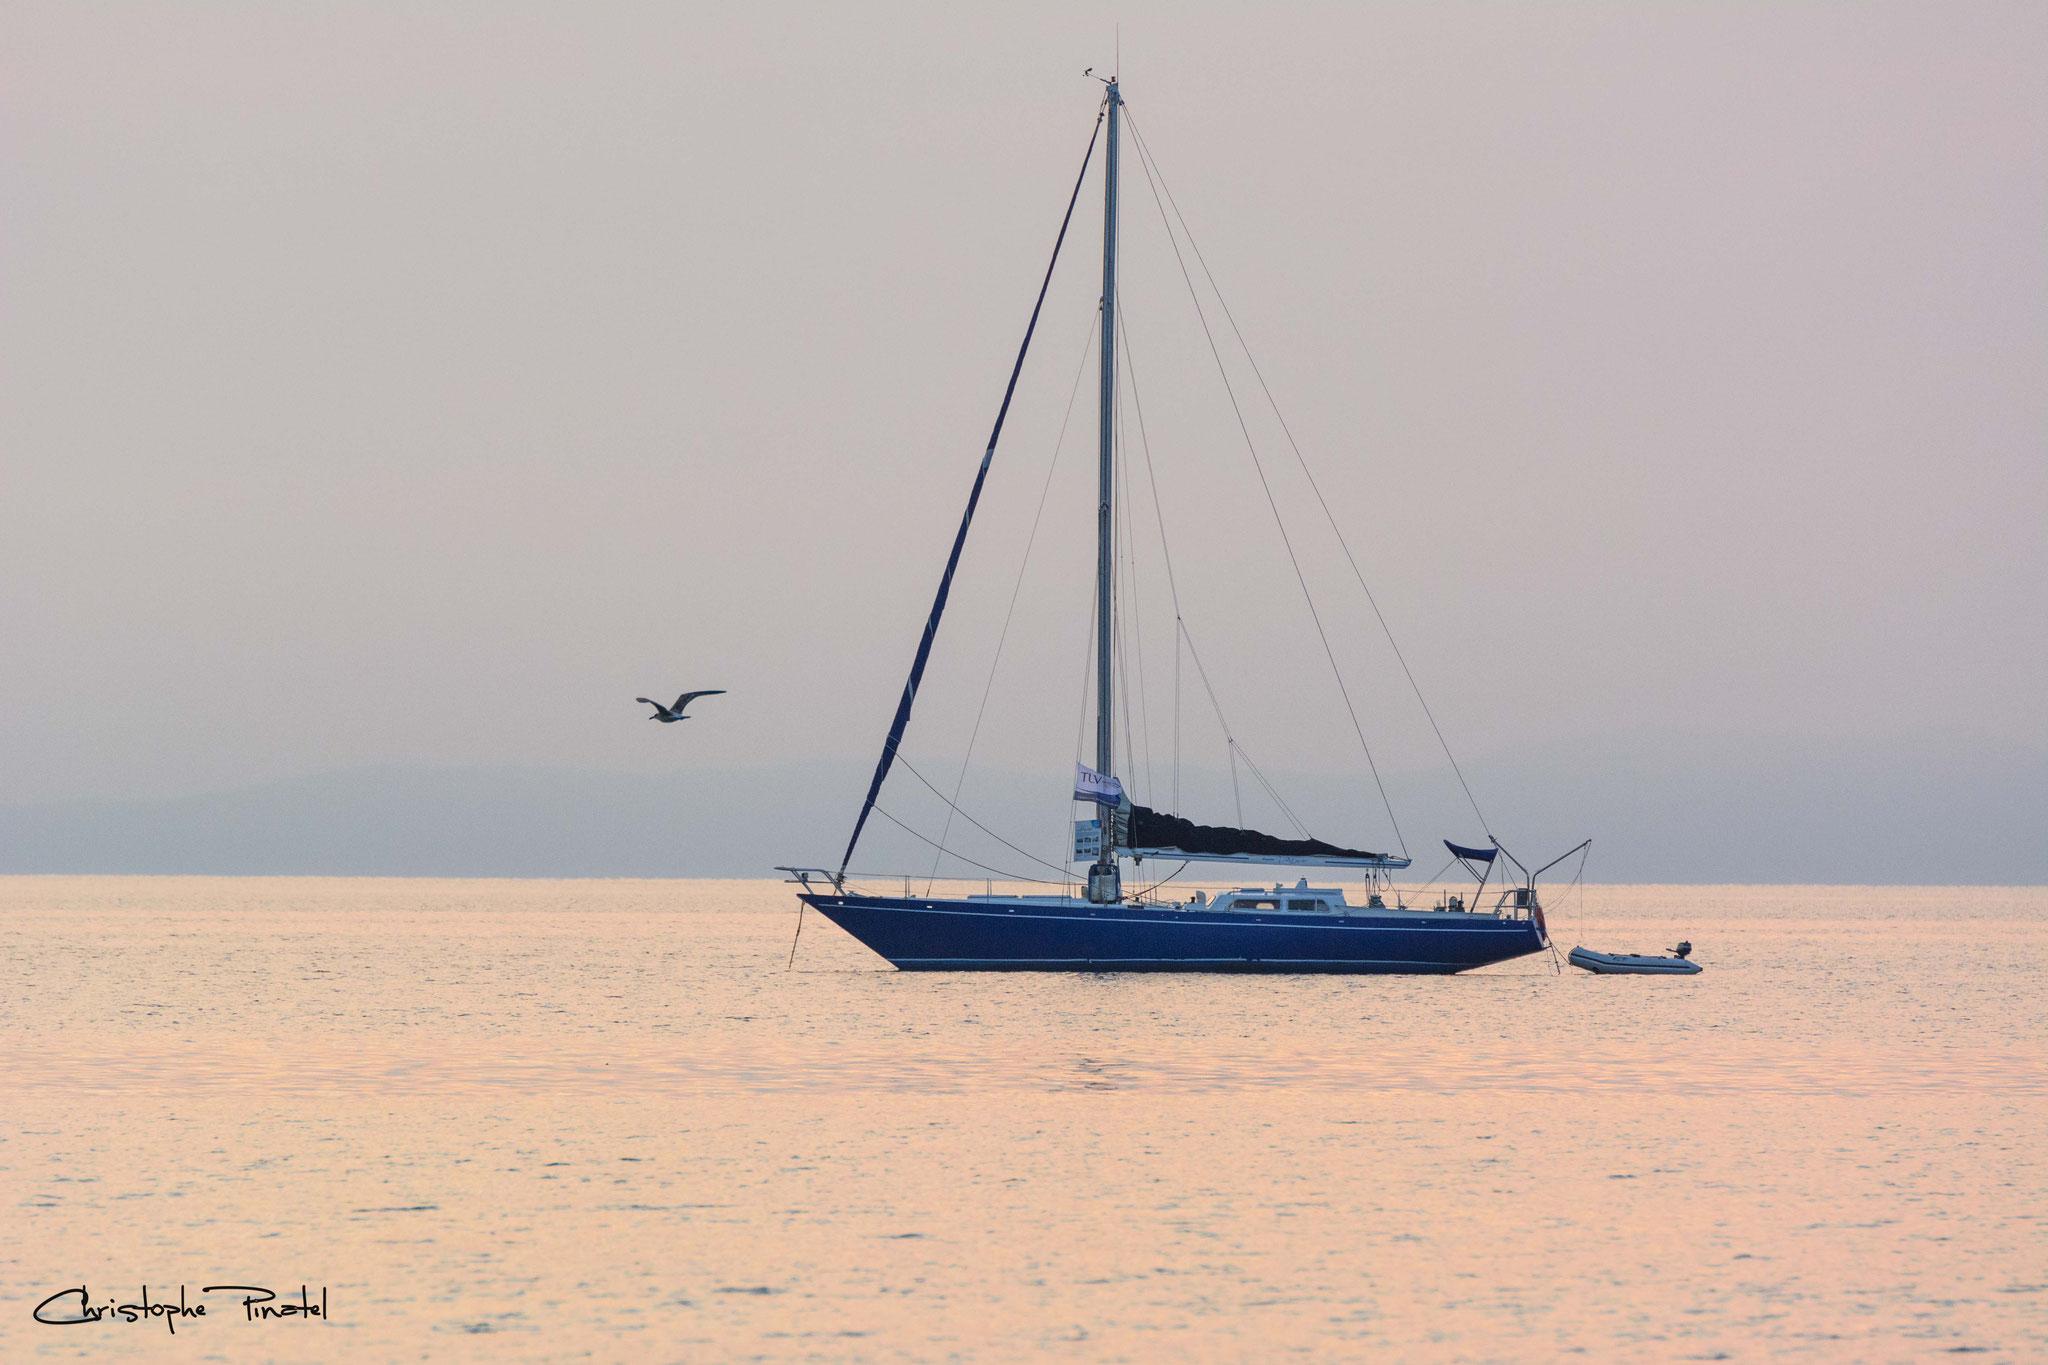 Photo 4 - Douceur marine